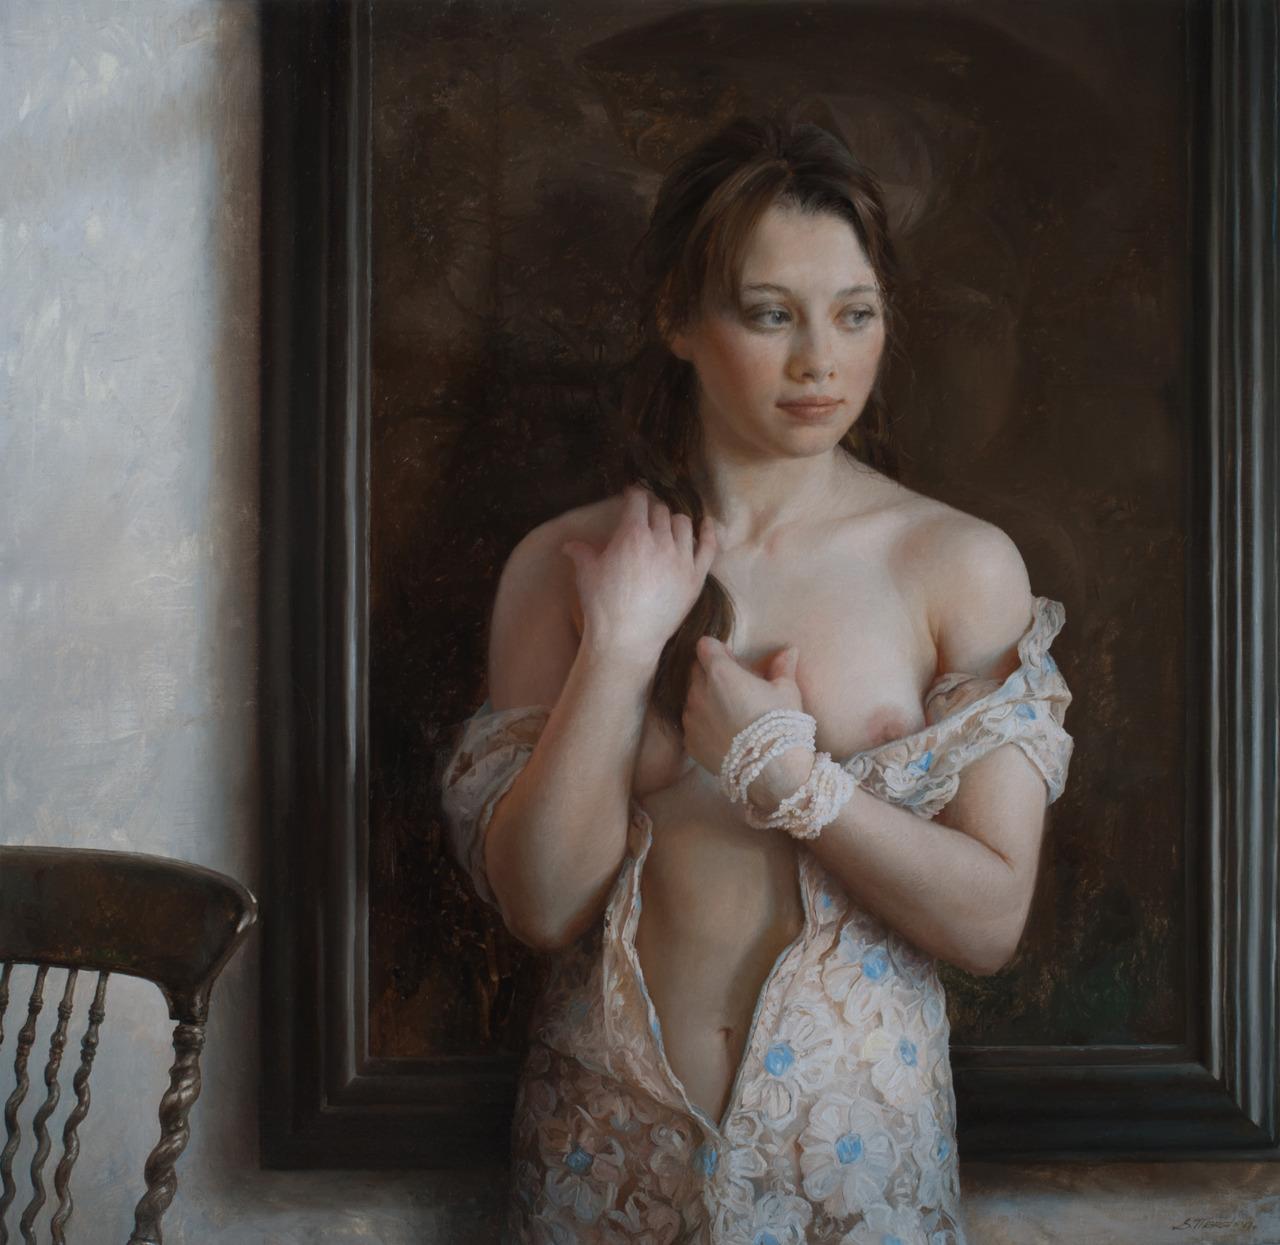 Women's images by a Russian realist artist Sergey Marshennikov - 21